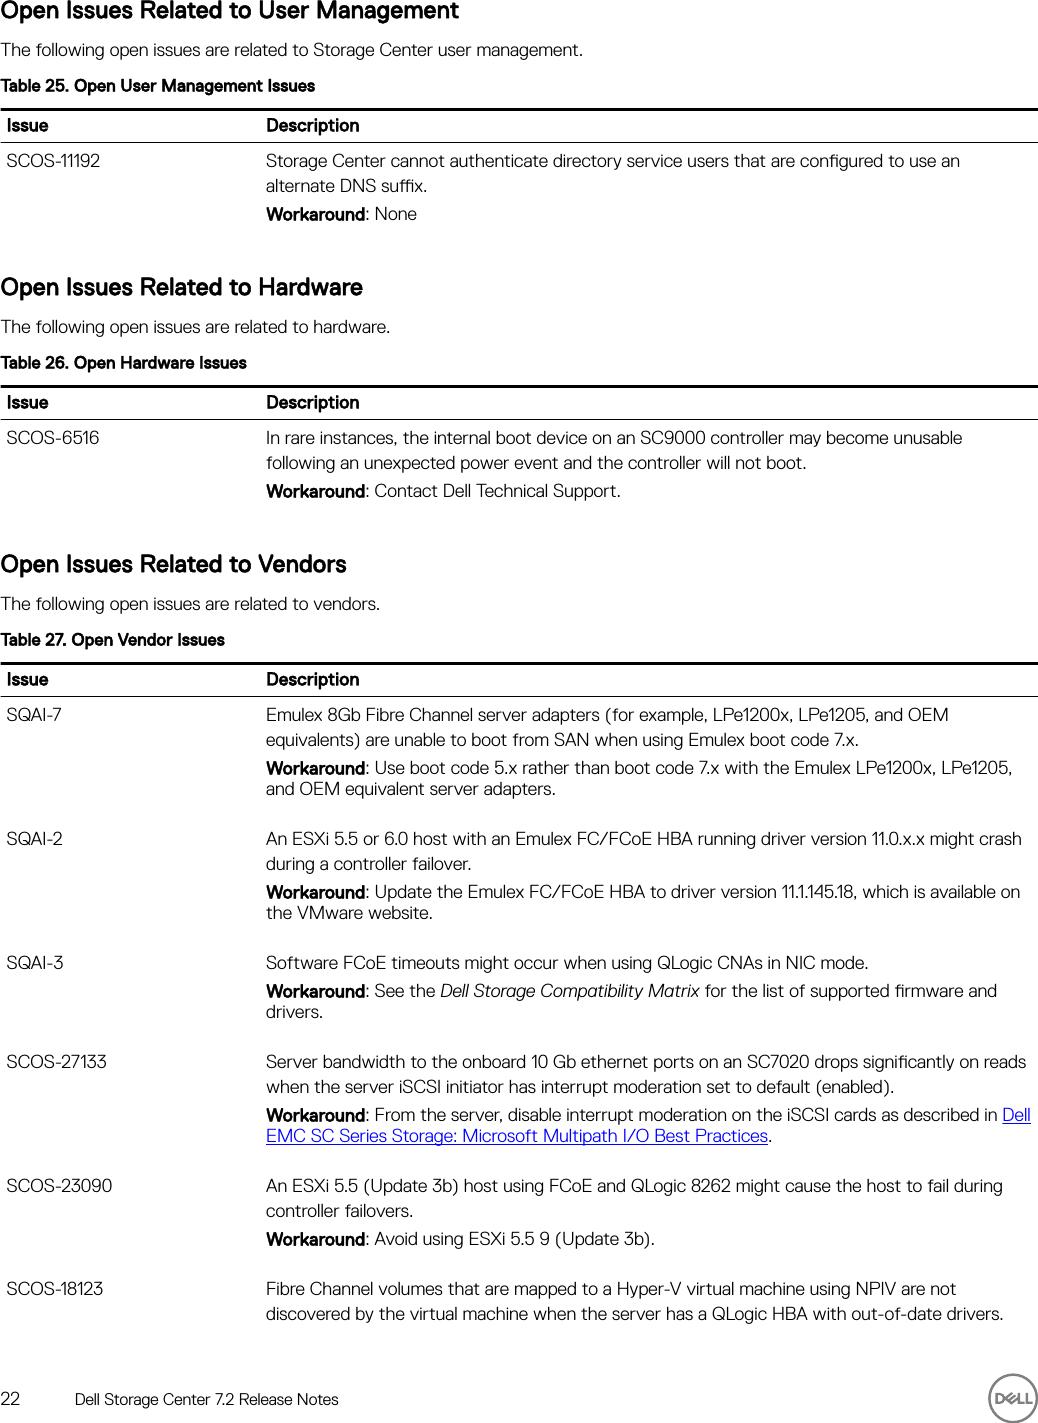 Dell compellent sc4020 Storage Center 7 2 Release Notes User Manual